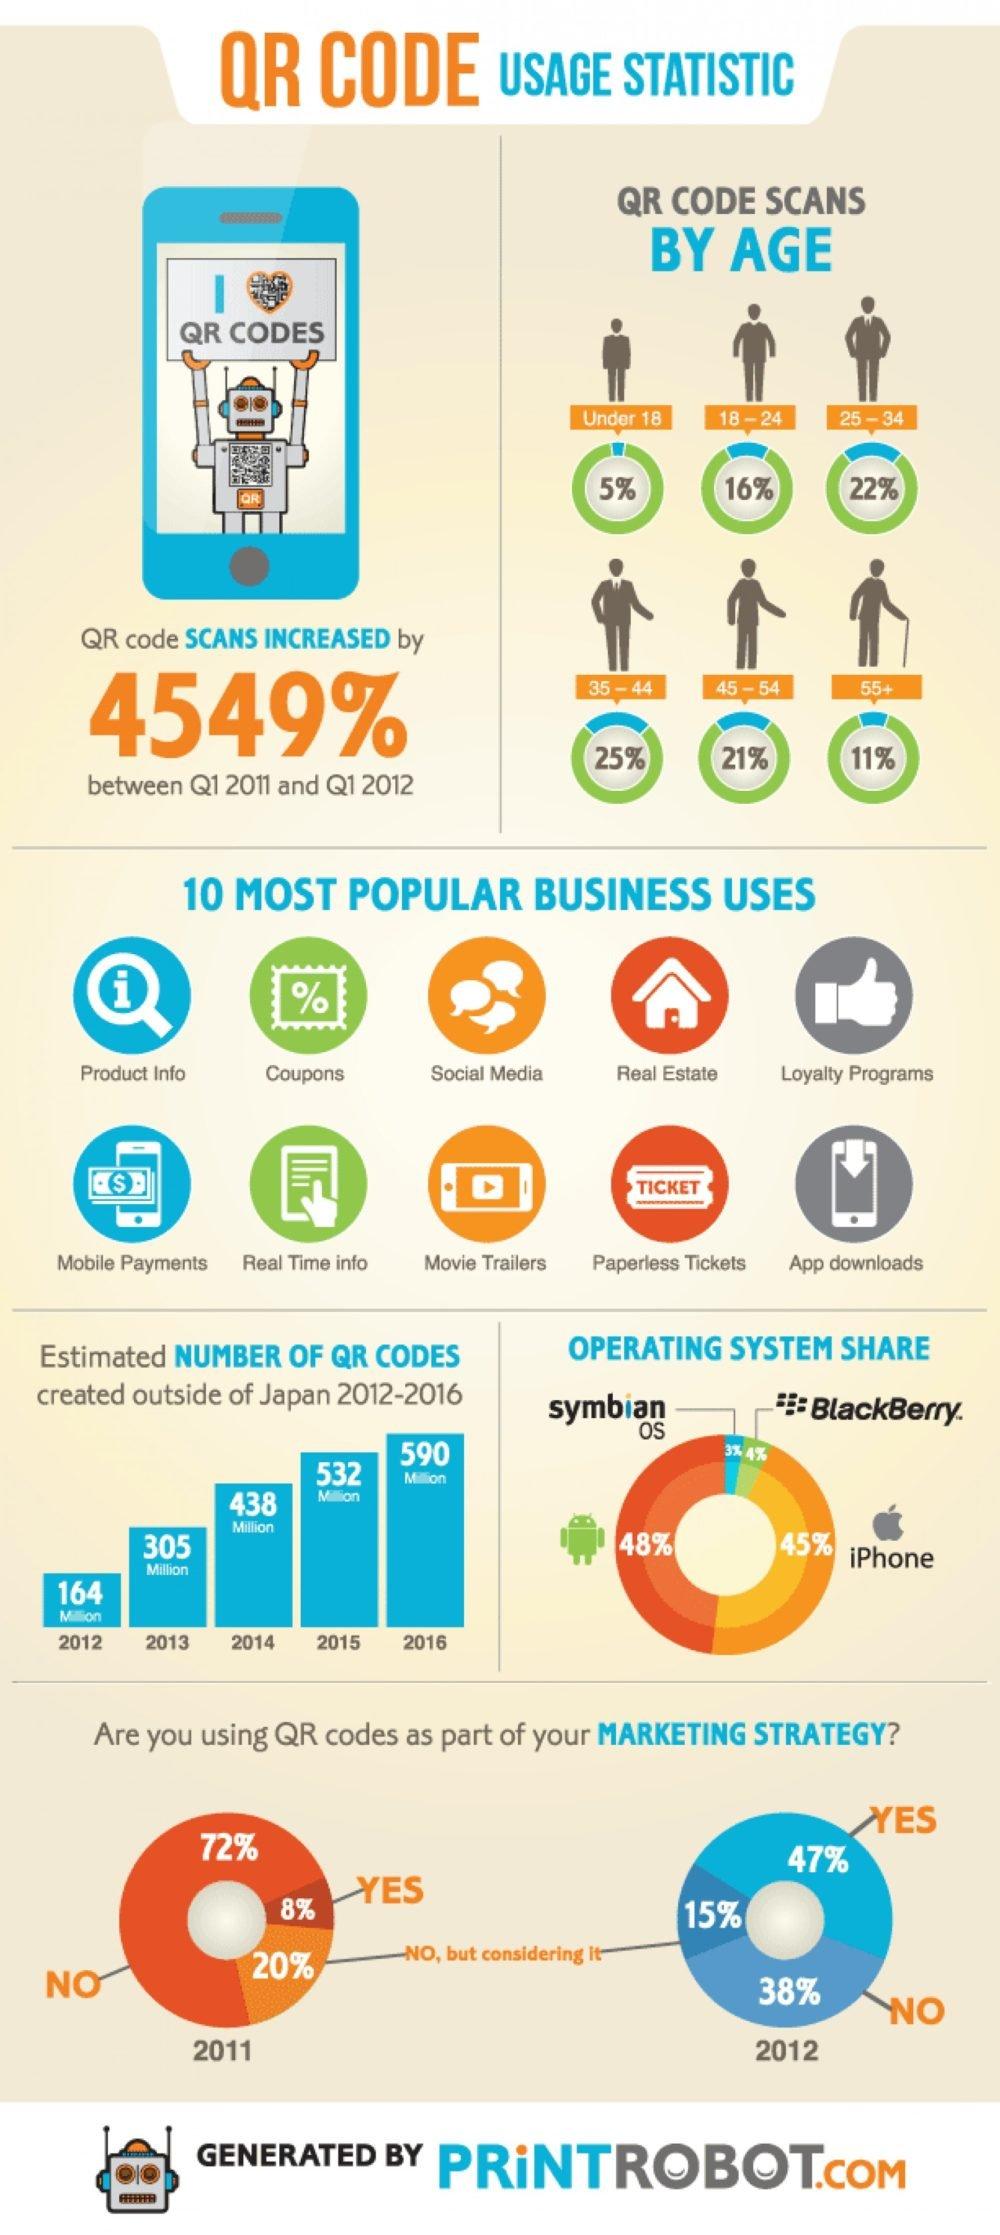 QR Code Usage Statistics